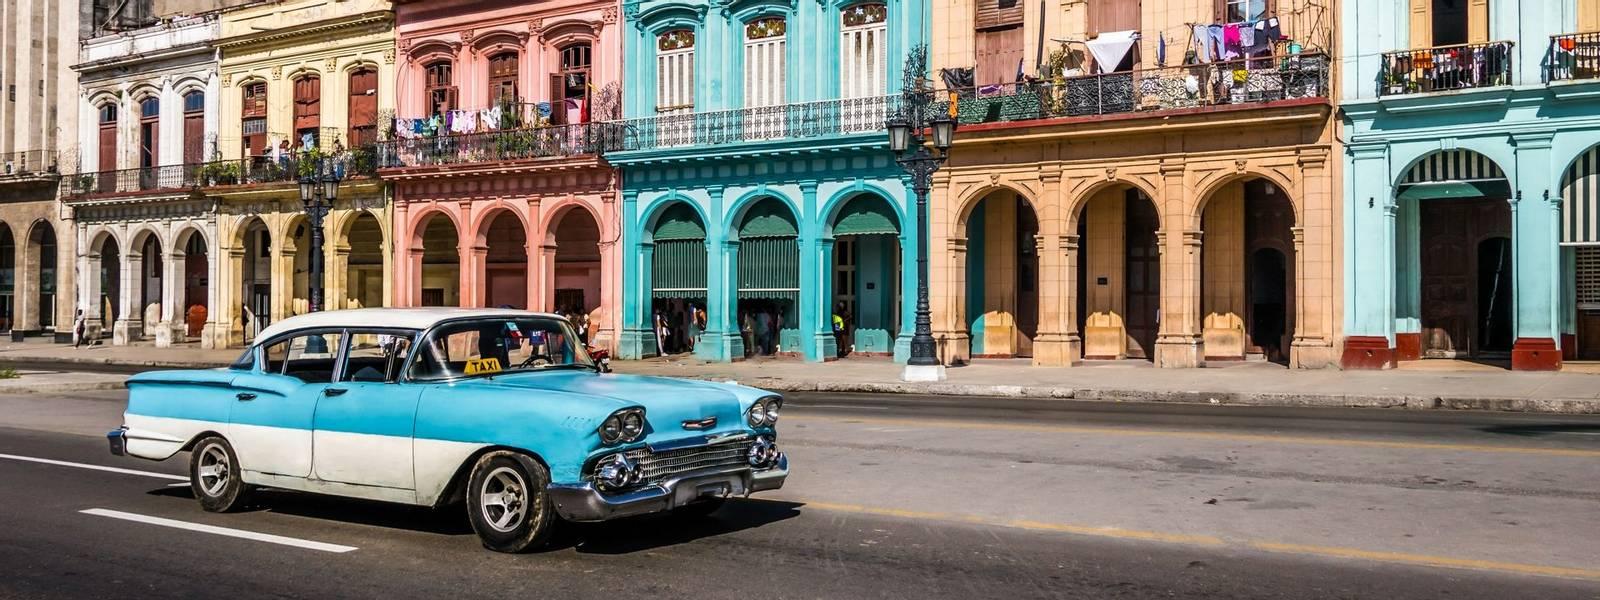 Old Havana downtown Street - Havana, Cuba